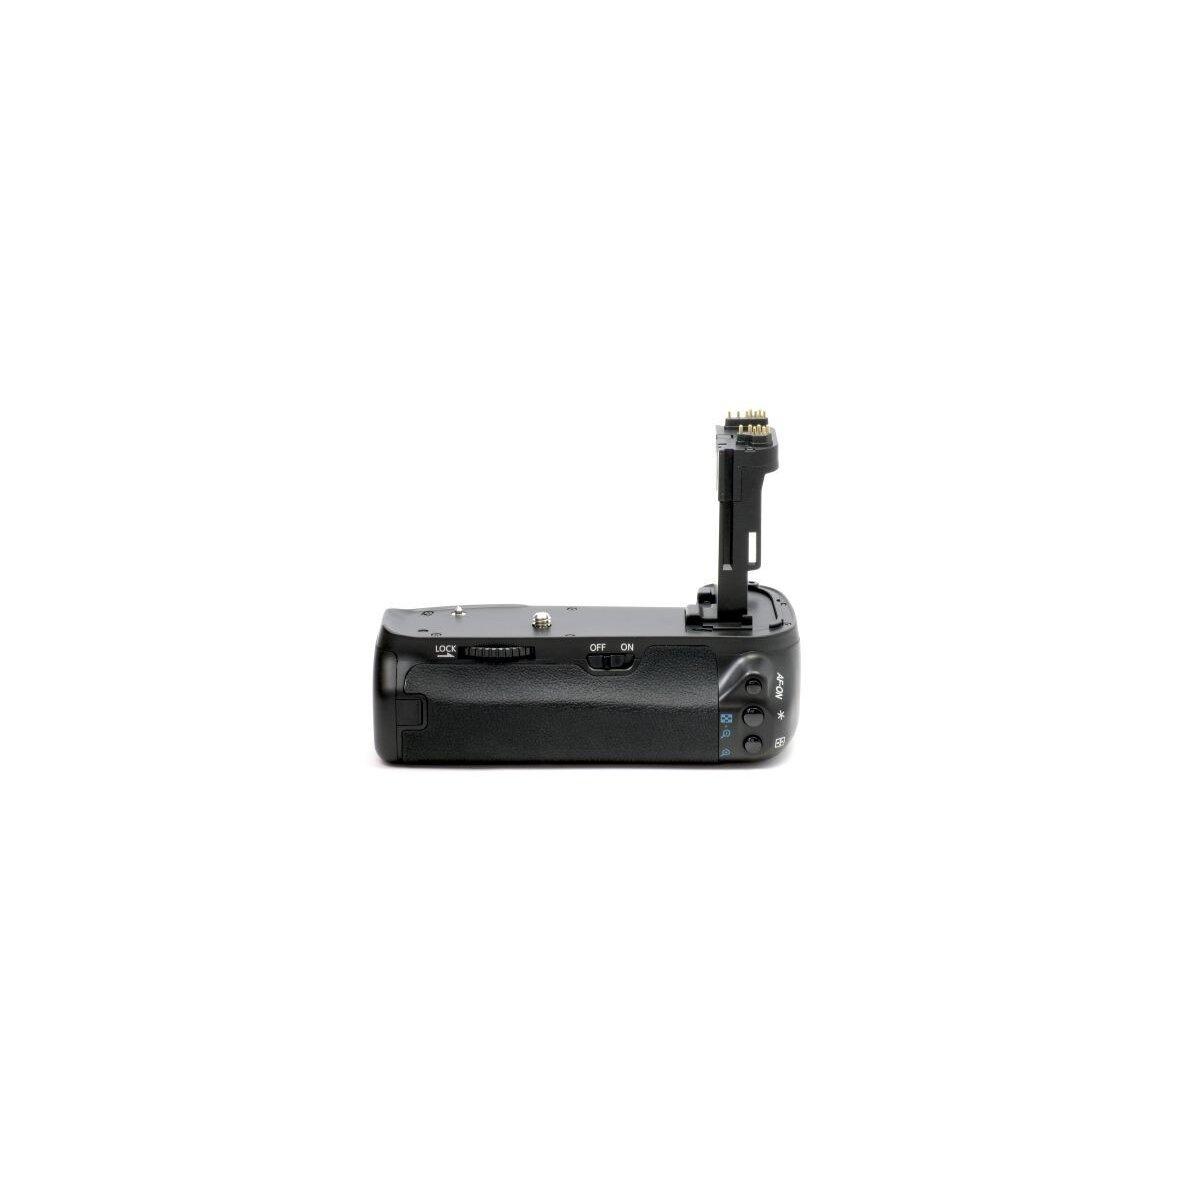 Minadax Profi Batteriegriff kompatibel für Canon EOS 6D Ersatz für BG-E13 - für 2x LP-E6 und 6x AA Batterien